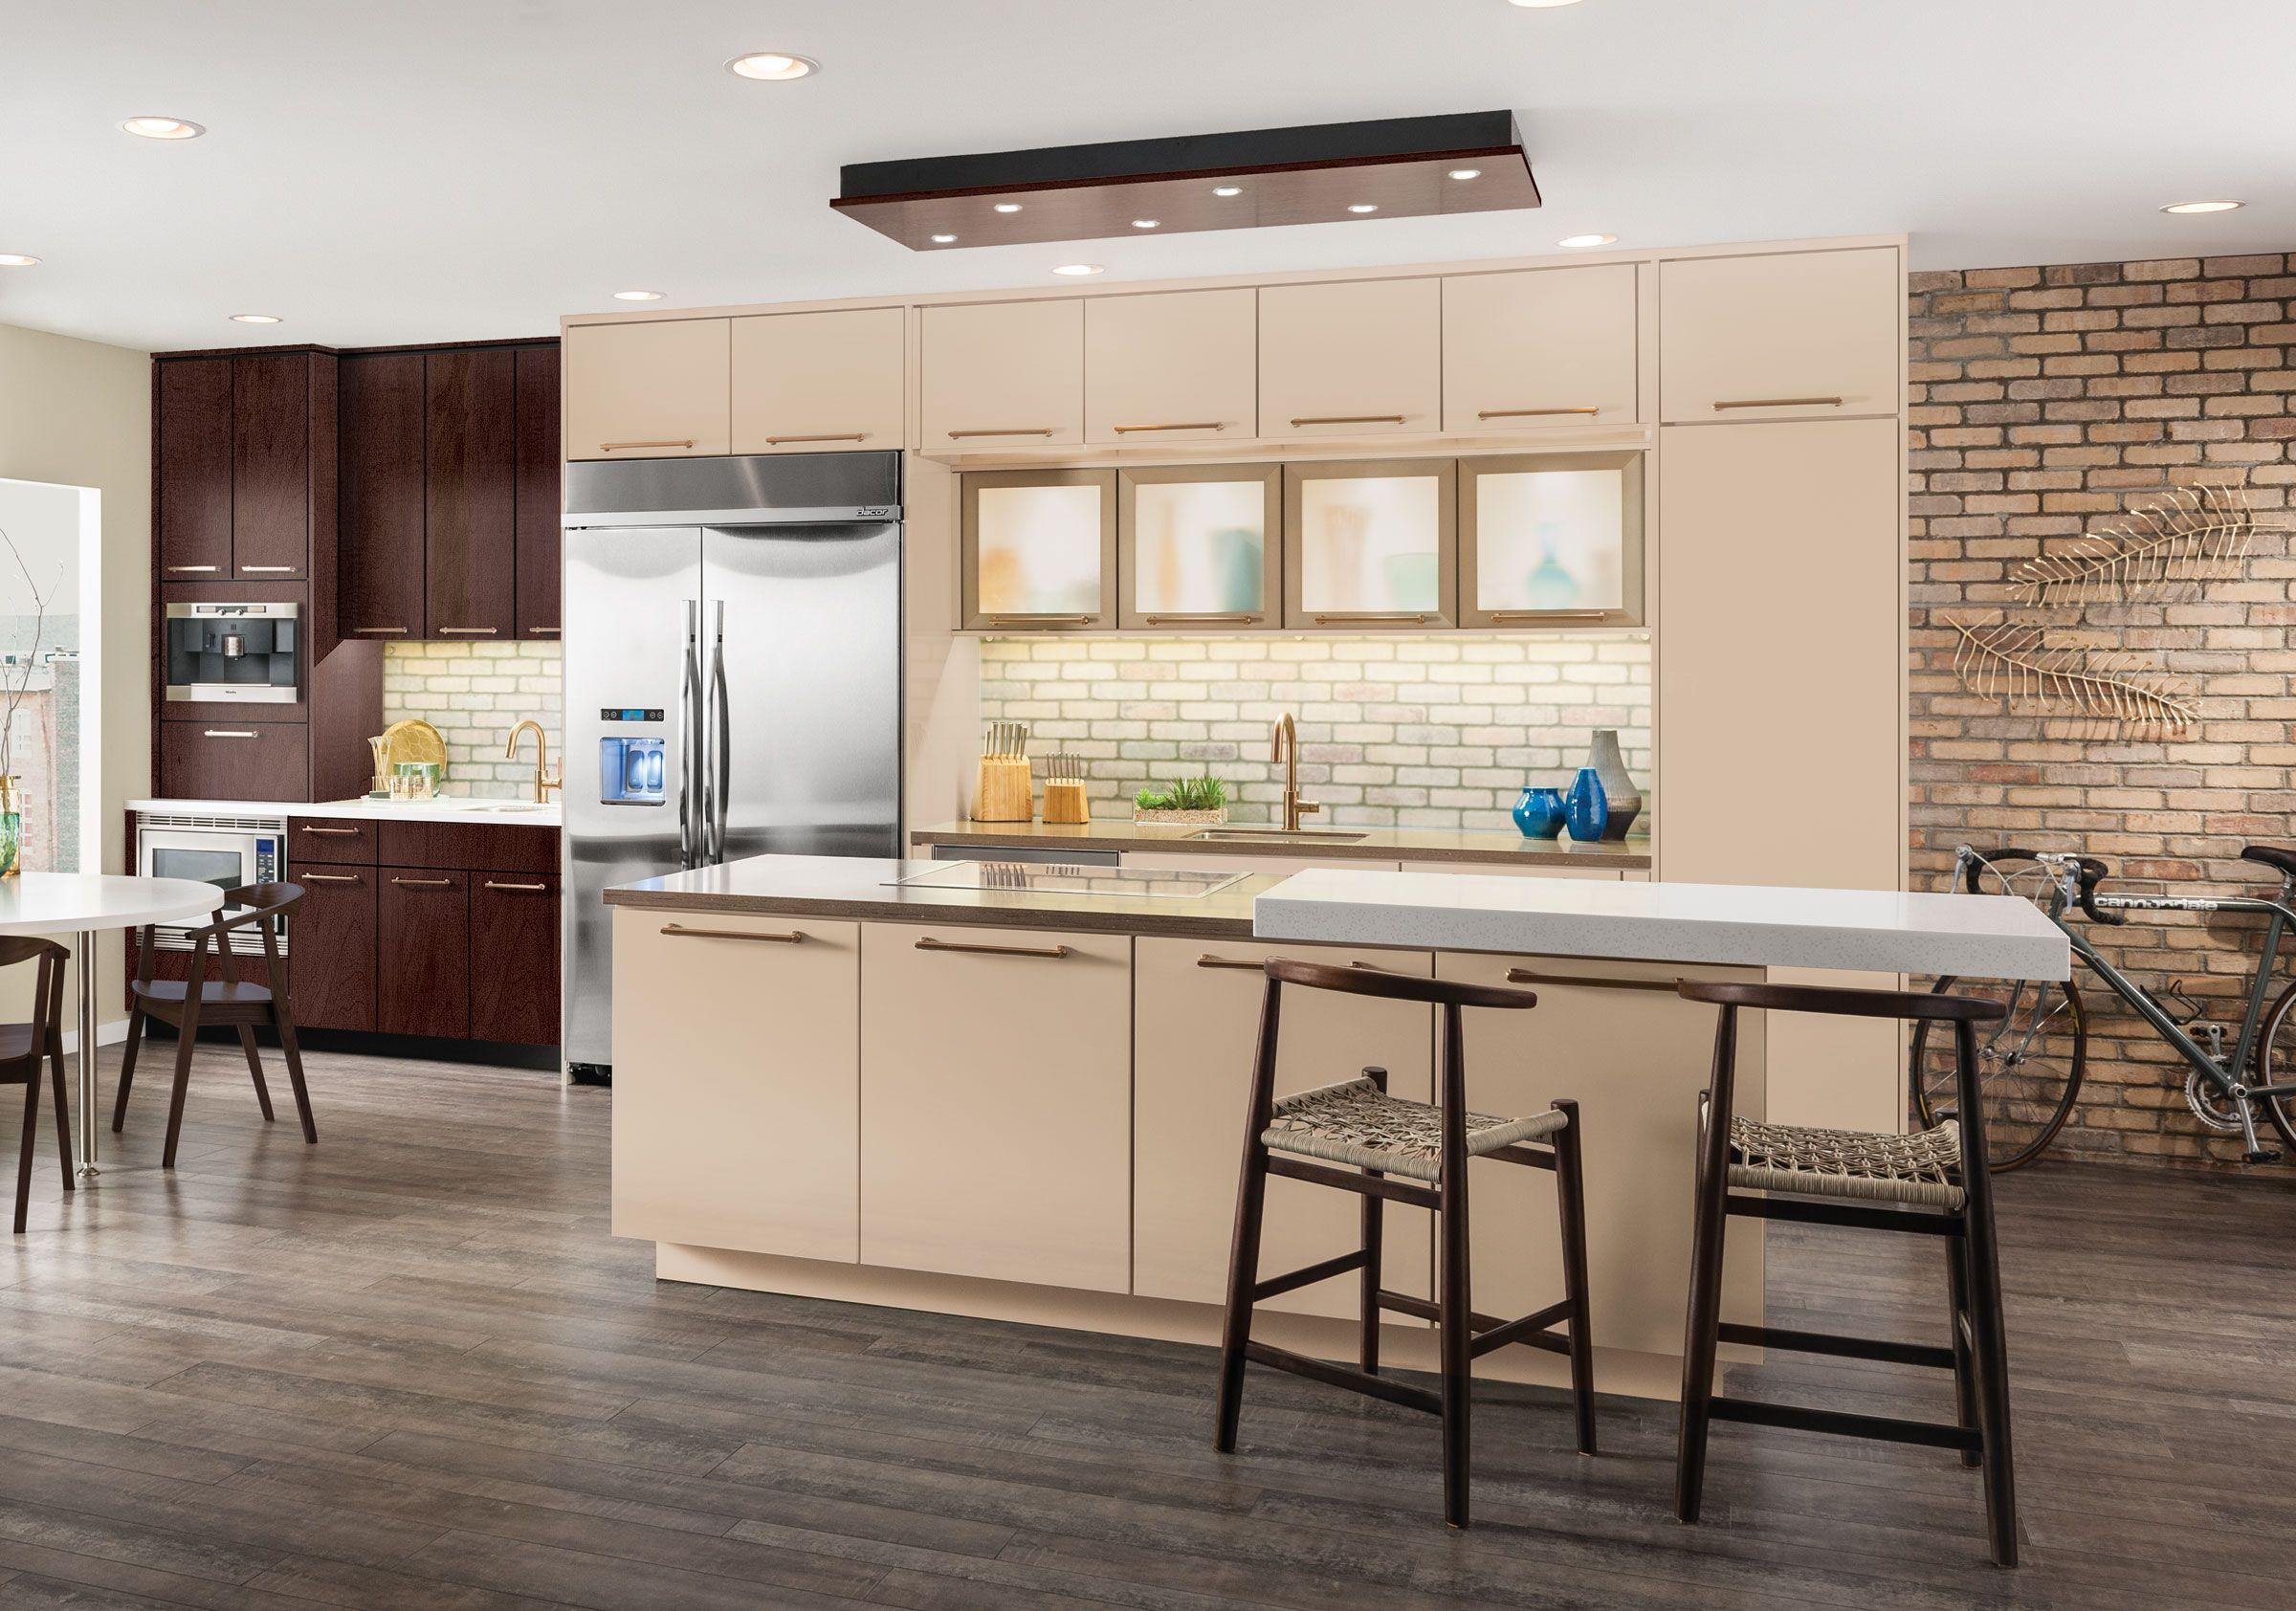 The Vetro Champagne Bronze Door takes center stage in this modern KraftMaid kitchen.